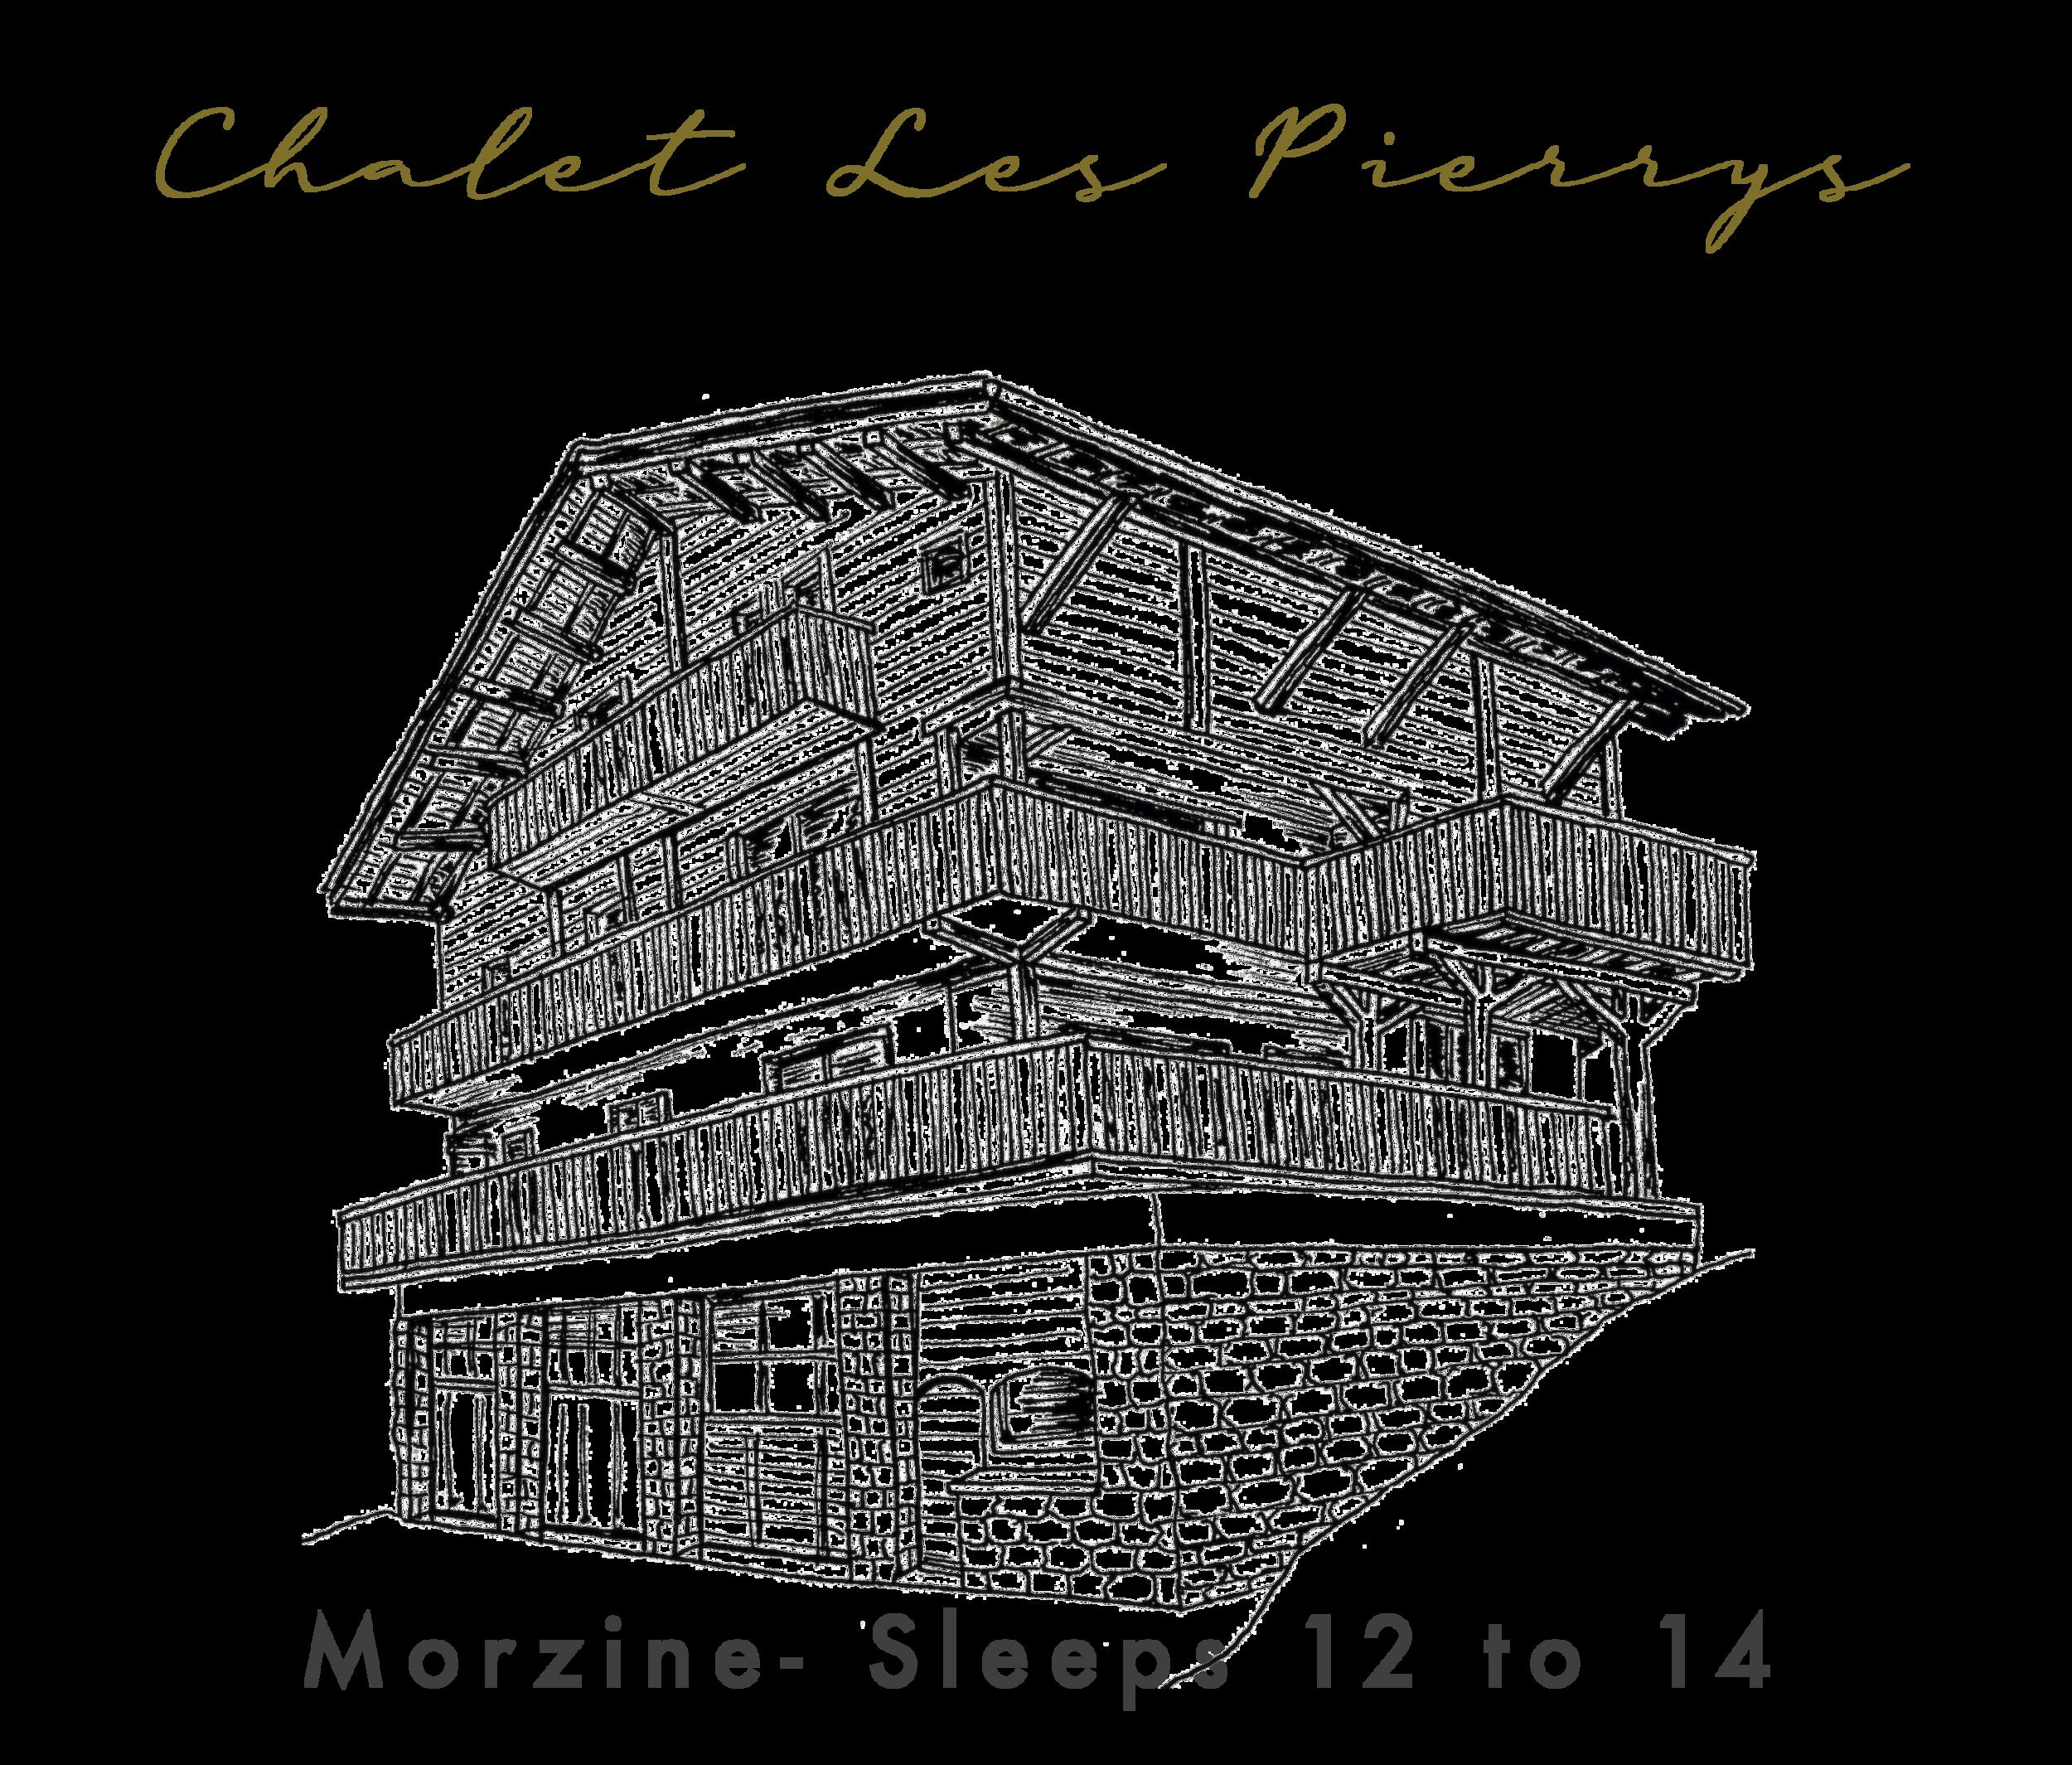 luxury-ski-chalet-les-pierrys-tgski-morzine-b.png